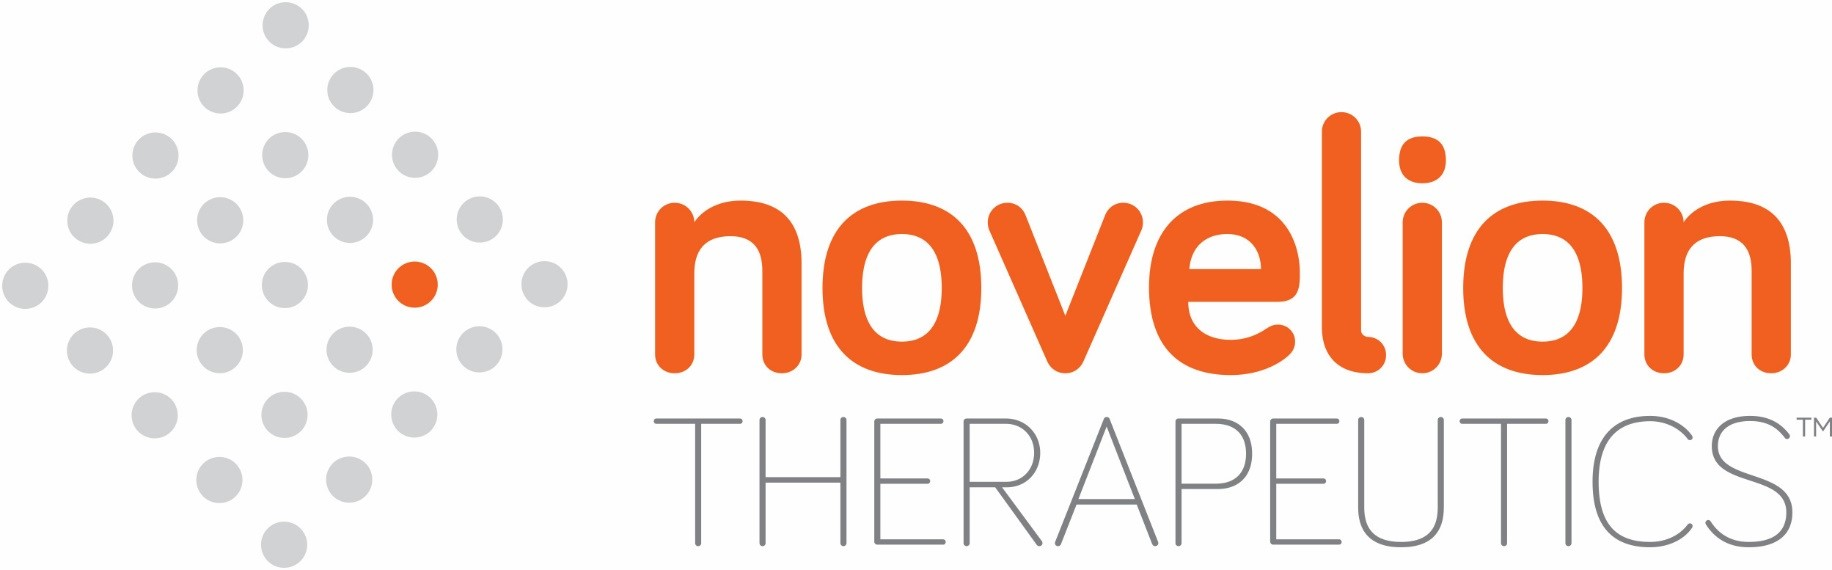 Novelion Therapeutics Provides Update on Effective Date of Liquidation